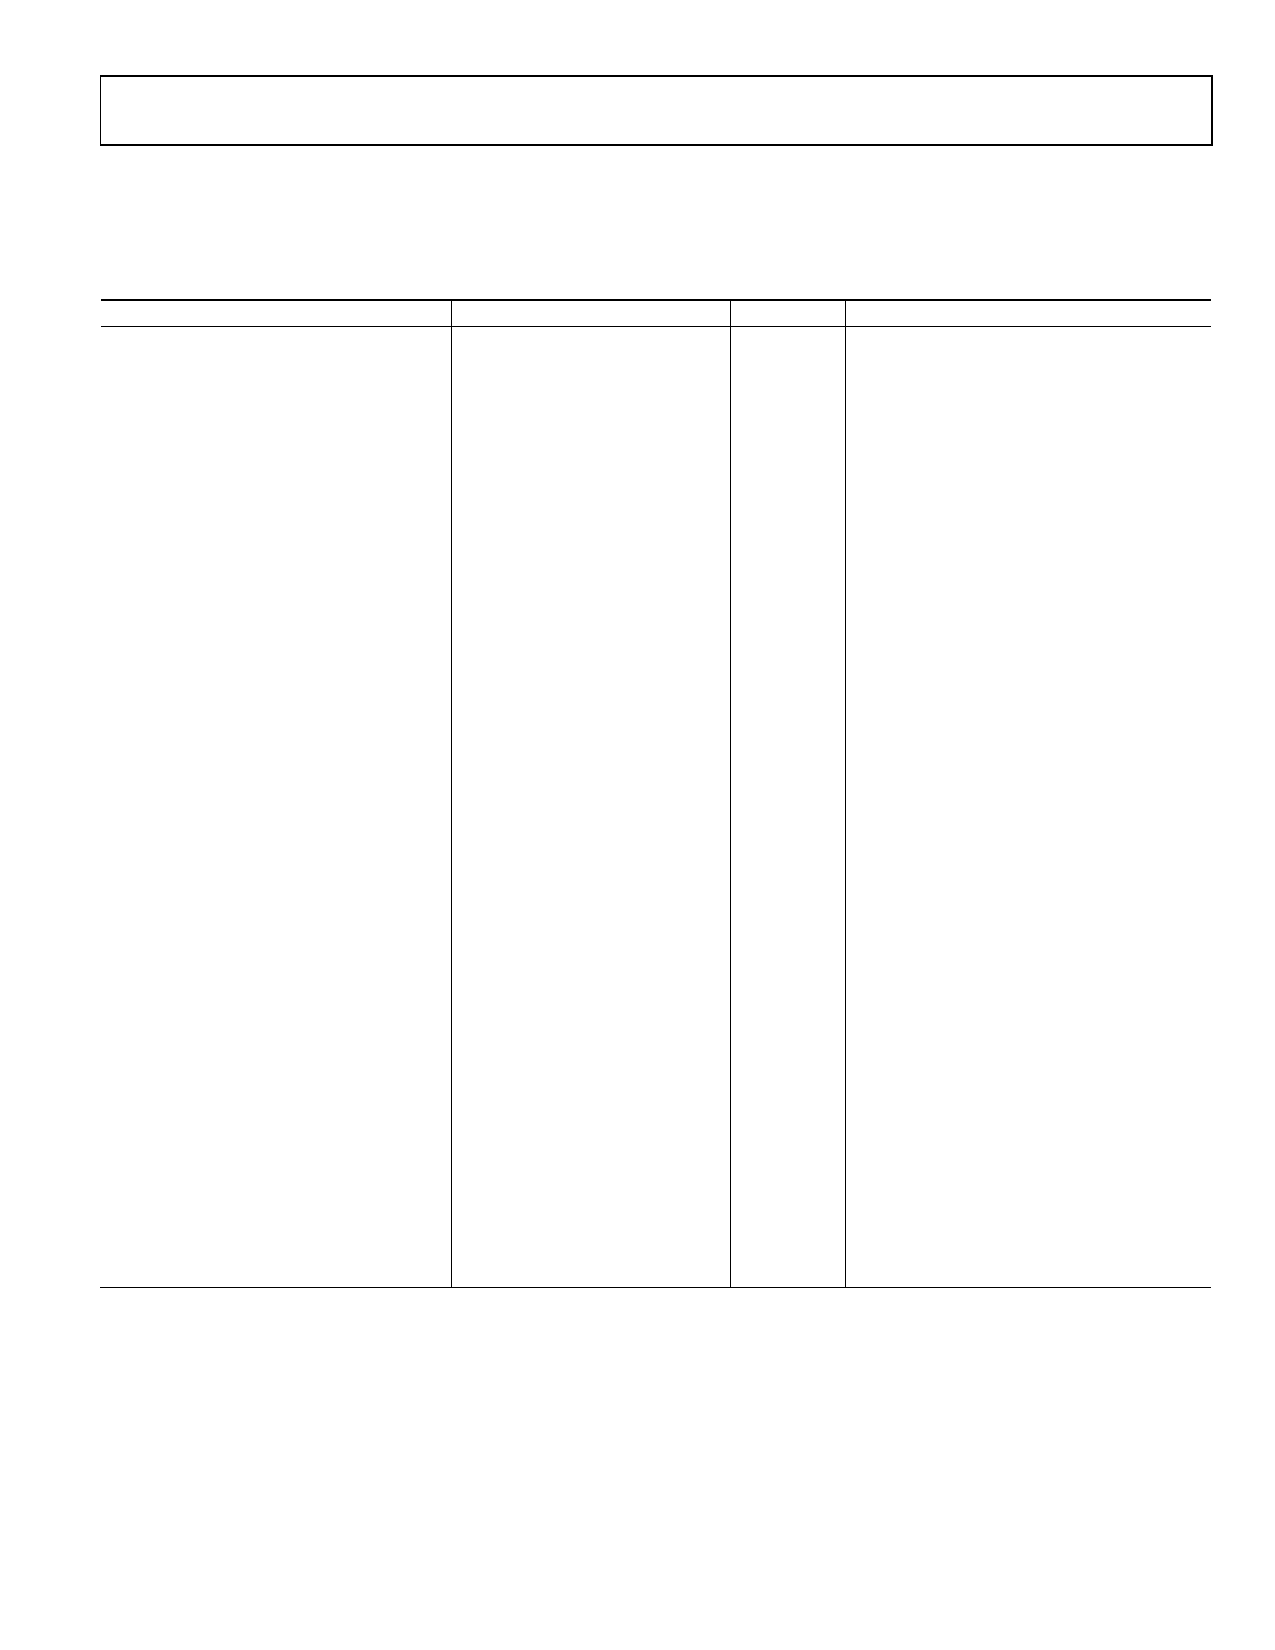 AD5422 pdf, arduino